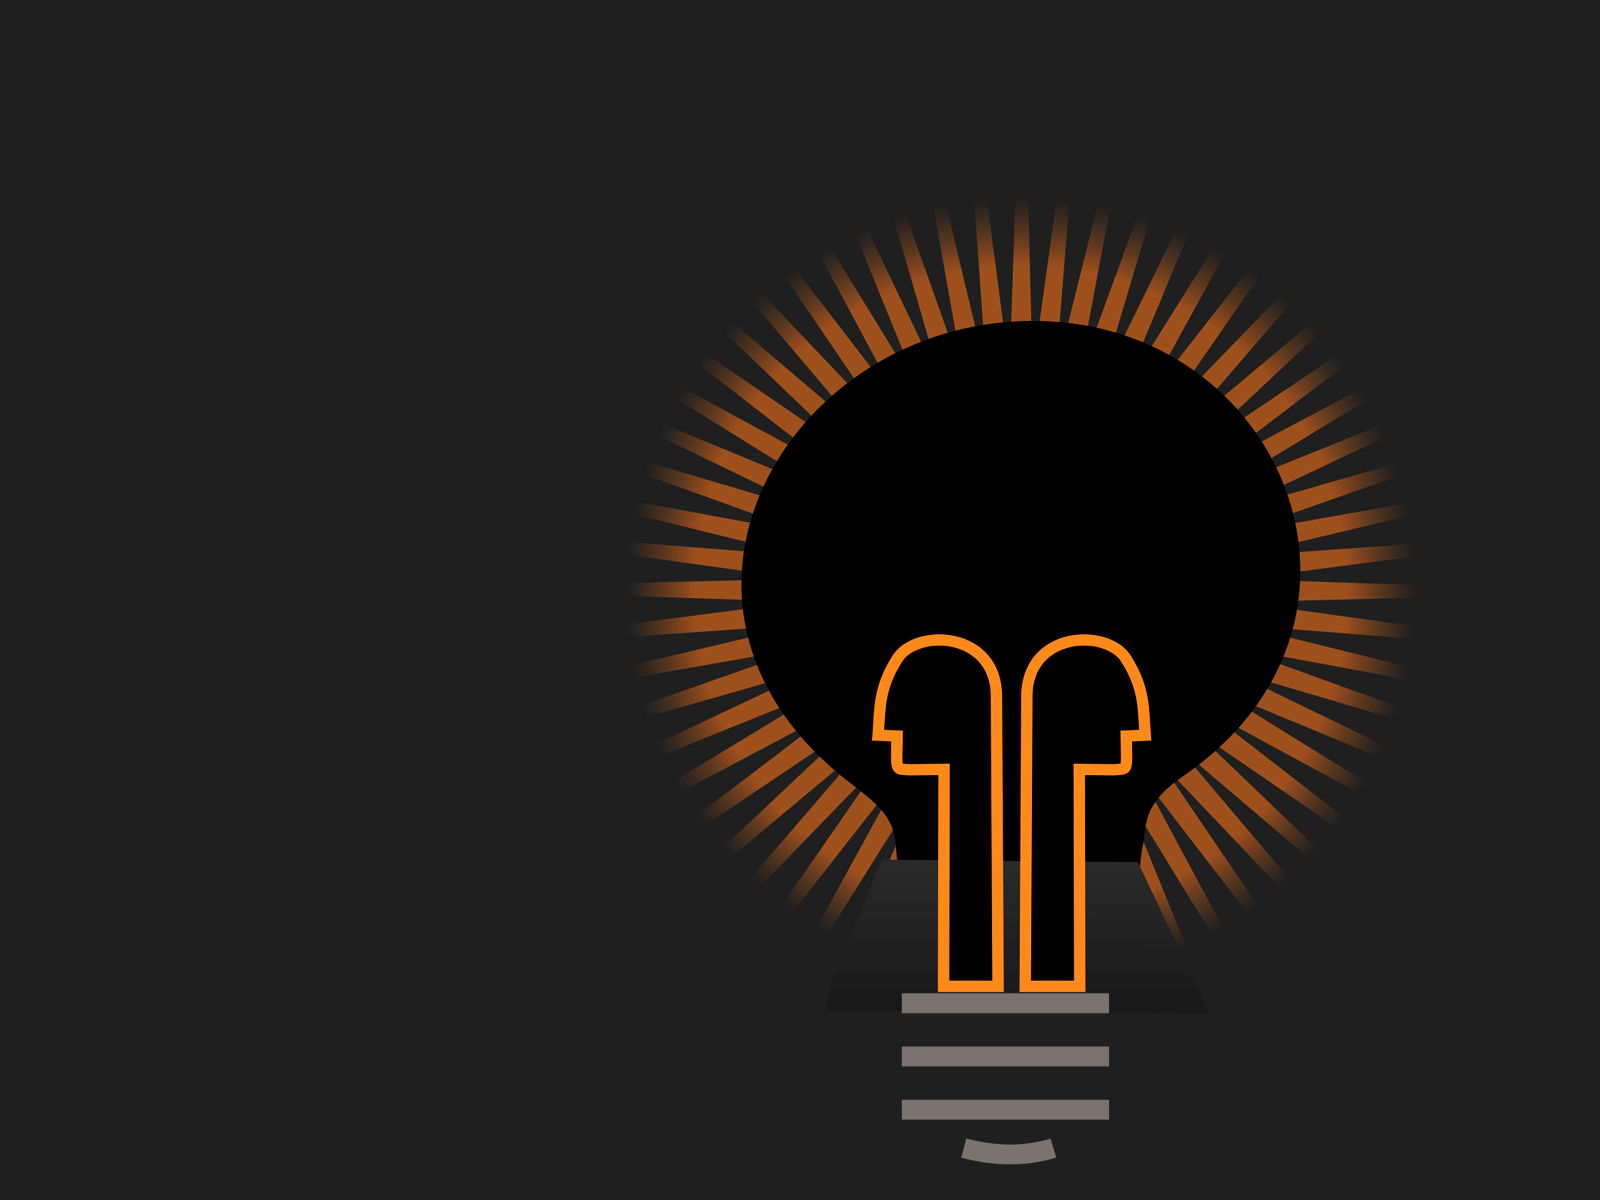 Light Bulb in Dark Backgrounds - Engineering, Technology - PPT ...